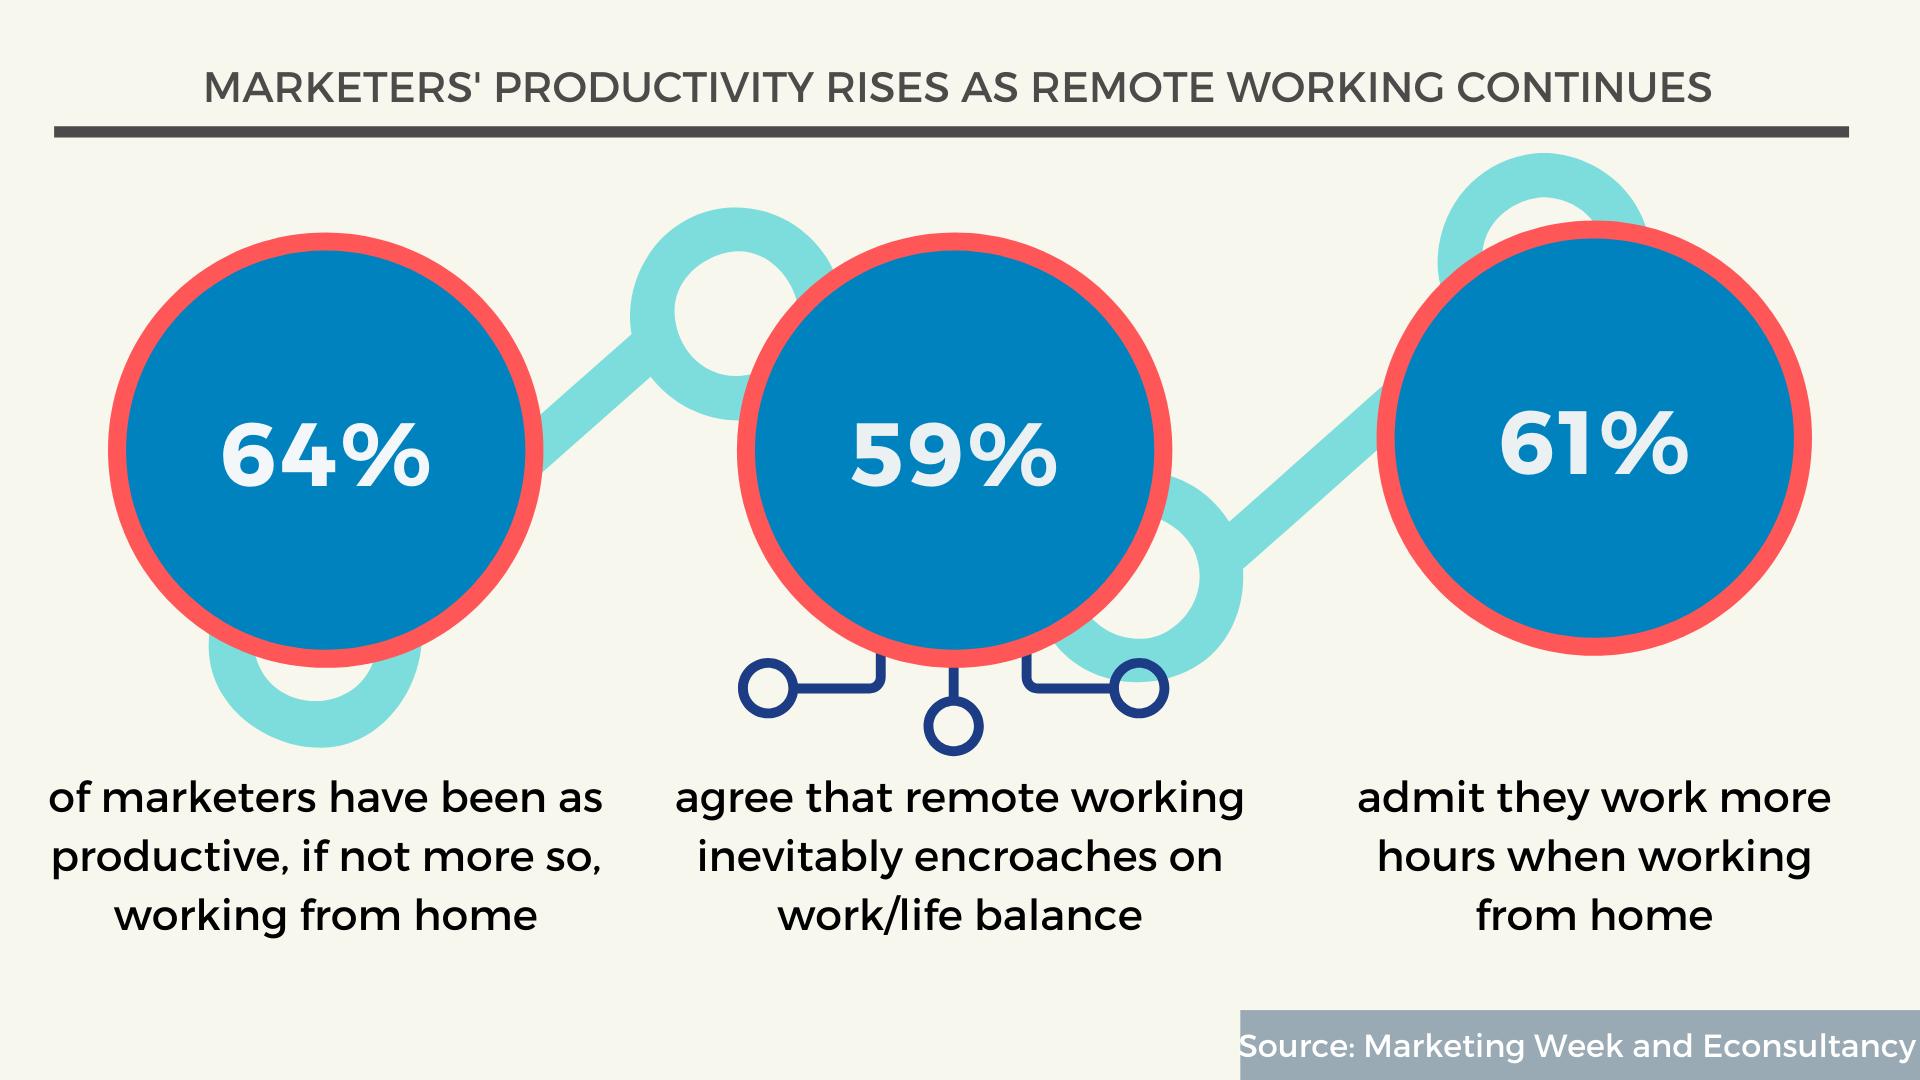 Marketers productivity